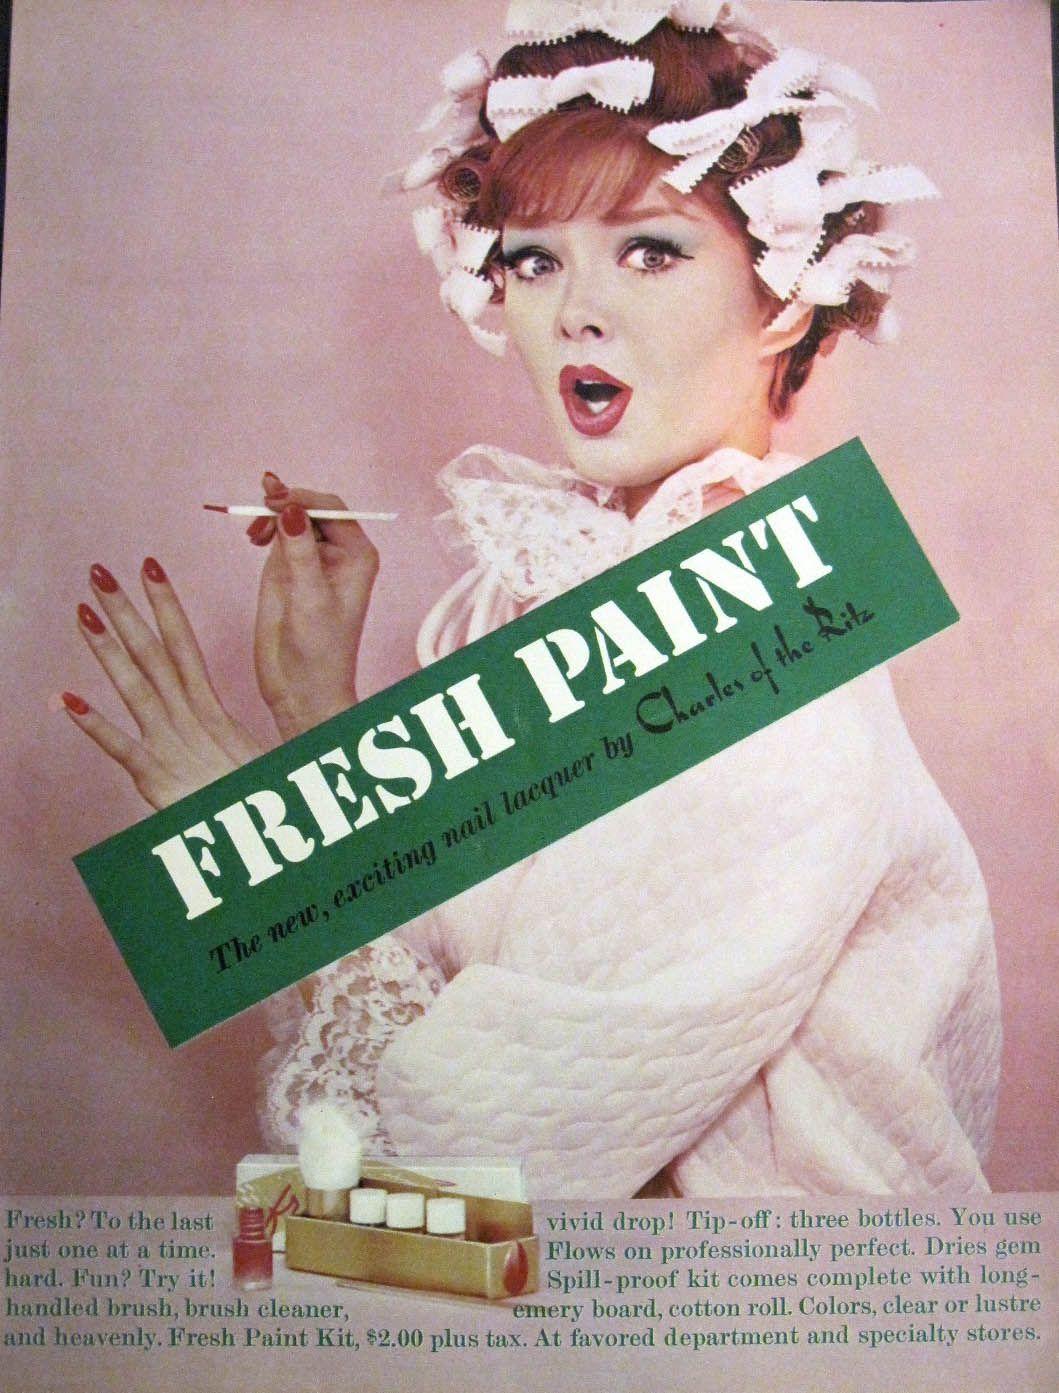 Vintage Nail polish Ad | Beauty, Charm and Poise | Pinterest ...